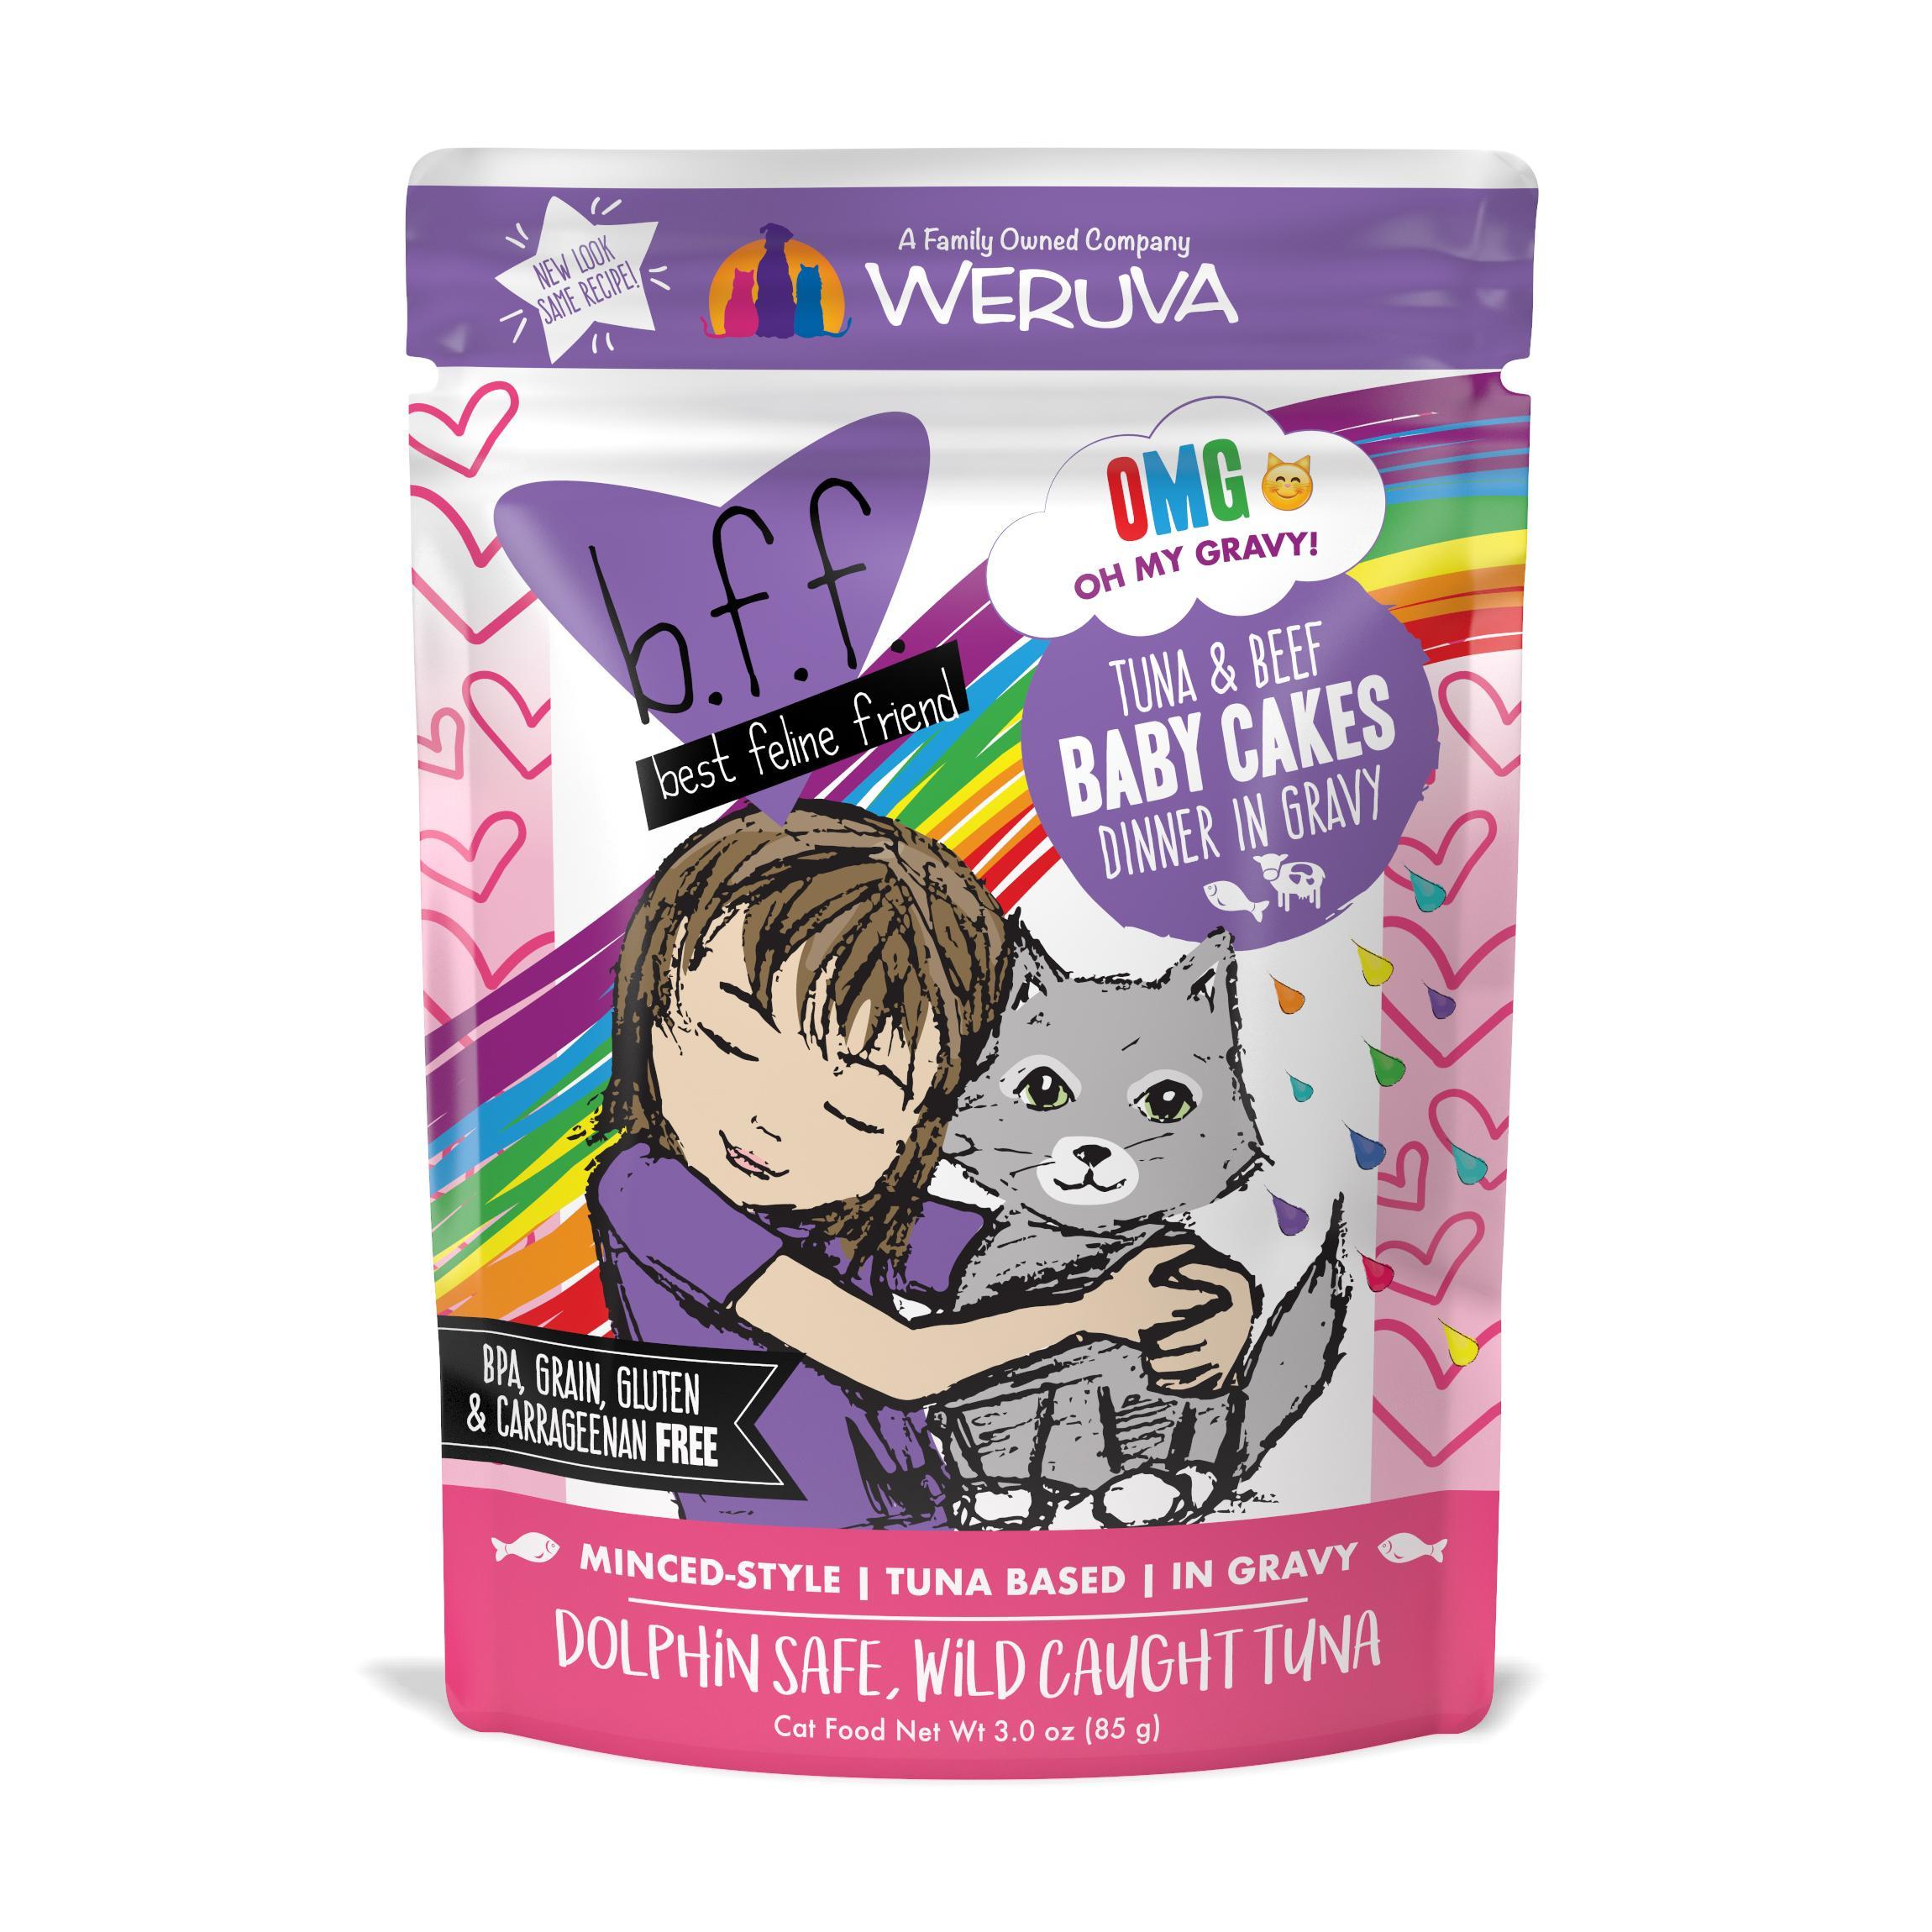 BFF Oh My Gravy! Baby Cakes Tuna & Beef Dinner in Gravy Grain-Free Wet Cat Food Image